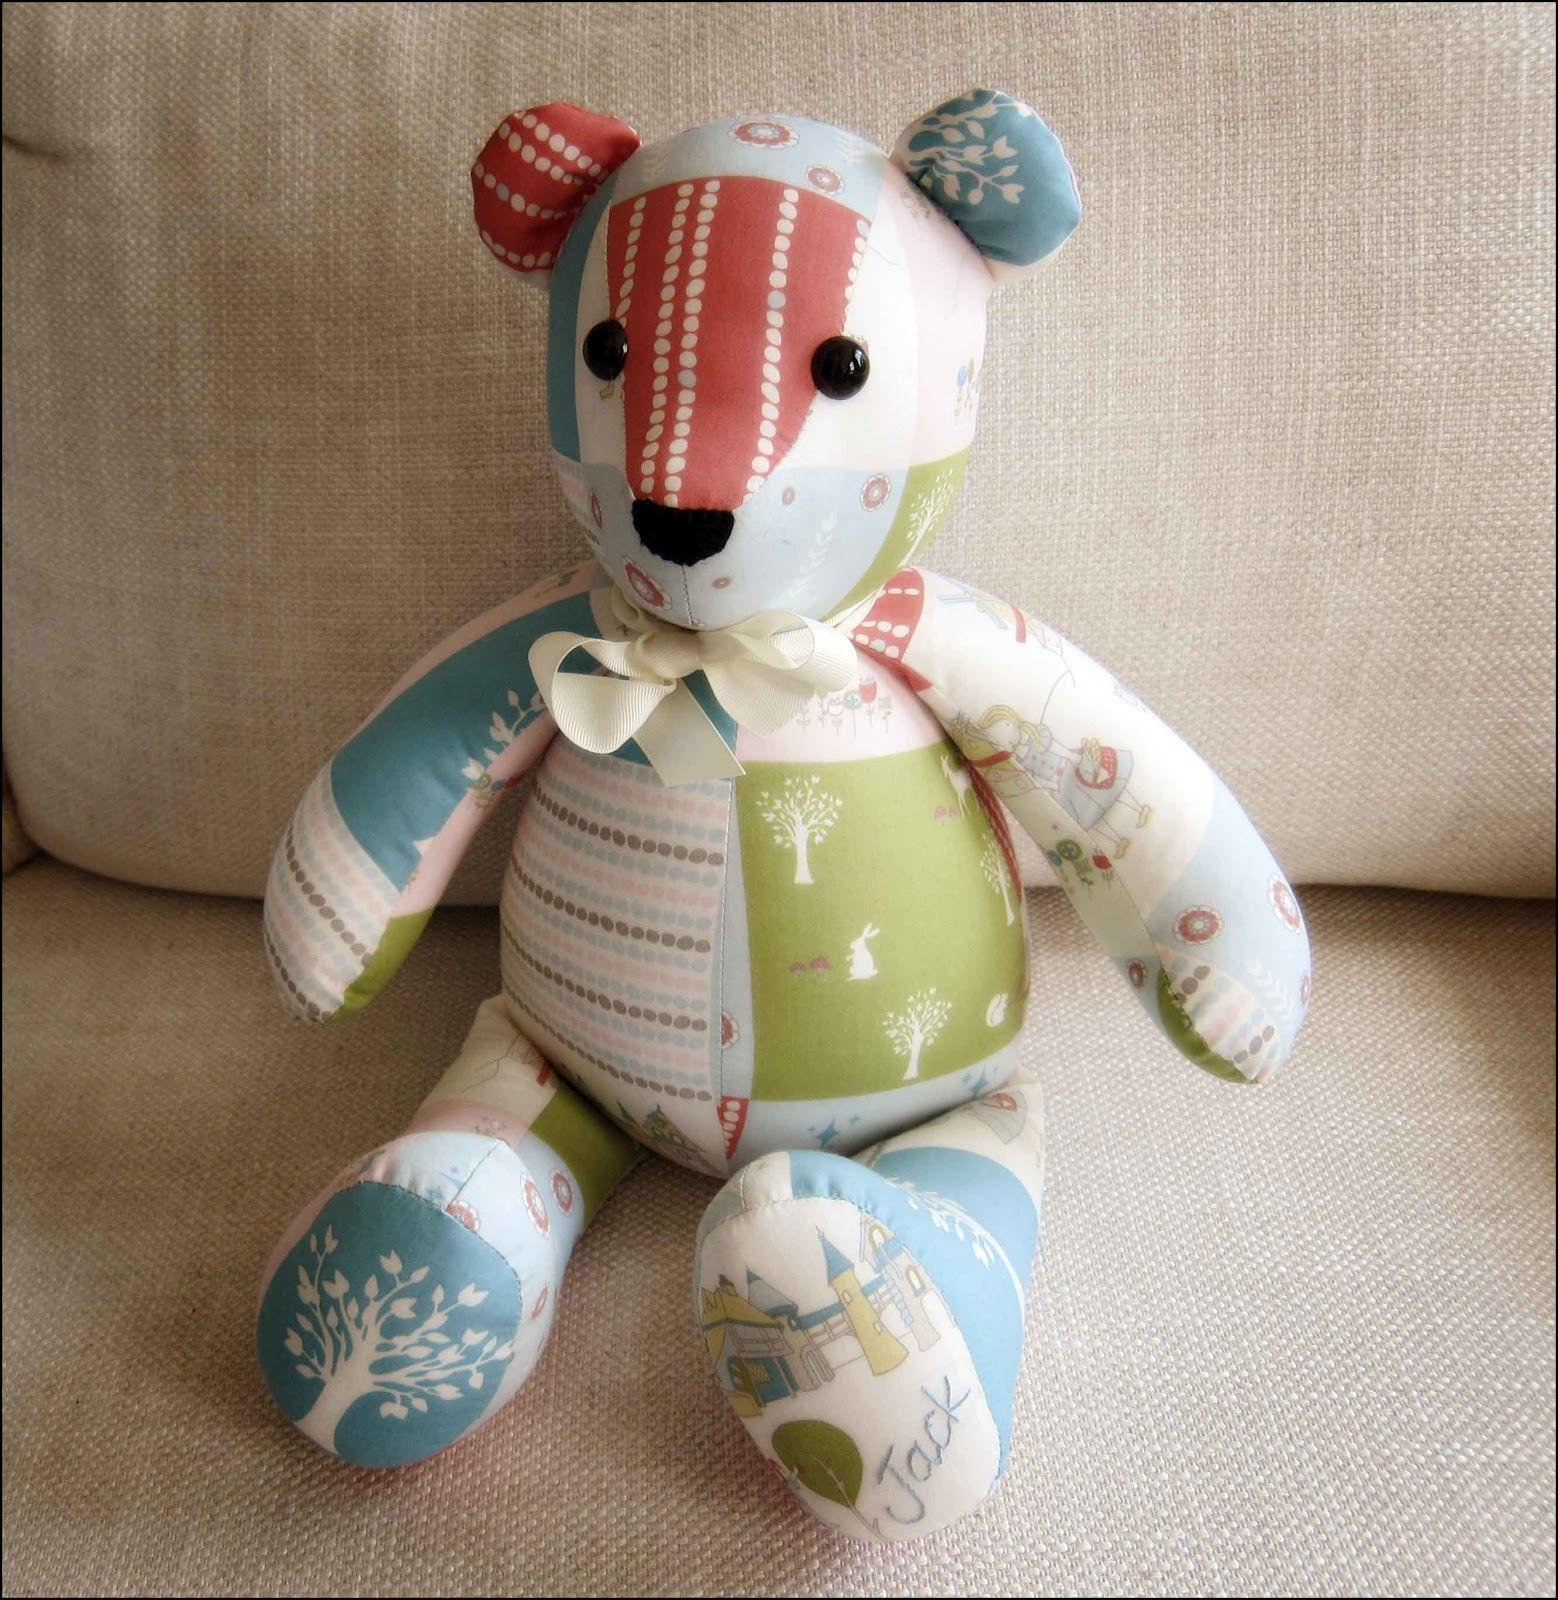 Memory Bear Pattern Free | Emily | Teddy Bear Sewing Pattern, Teddy - Memory Bear Sewing Pattern Free Printable